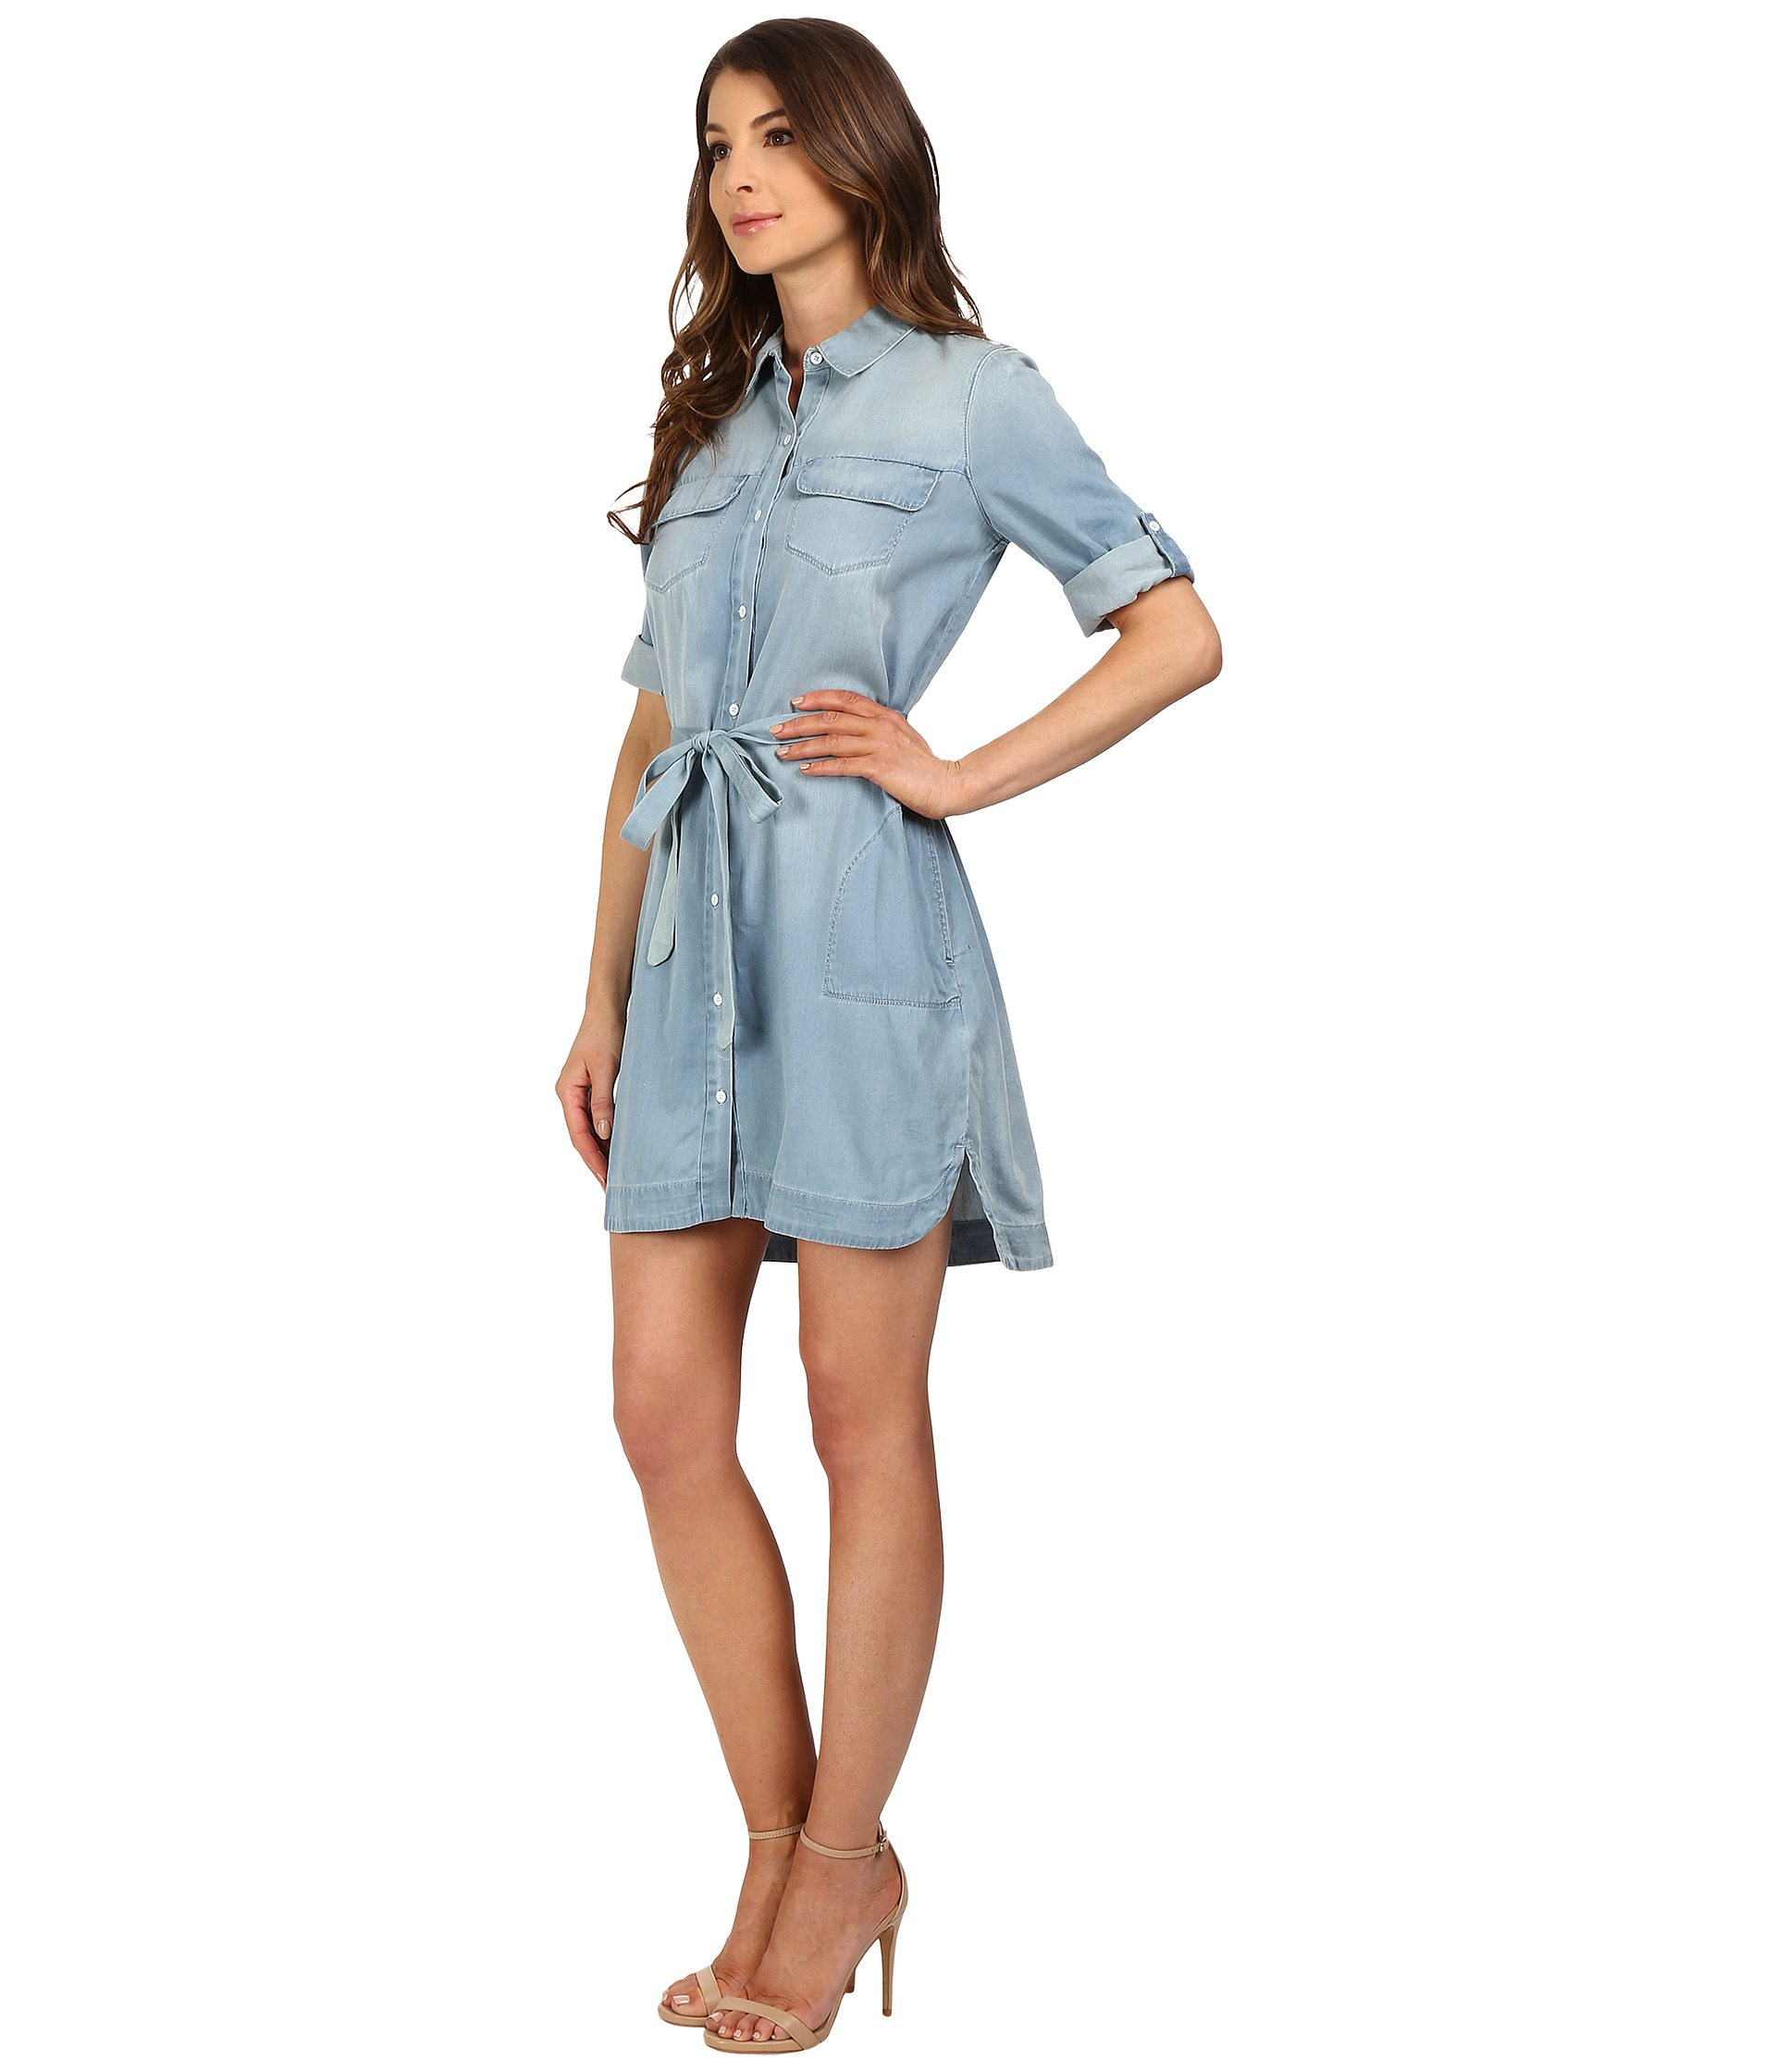 1aeb9c55b2 Lyst - Calvin Klein Drawstring Denim Dress in Blue